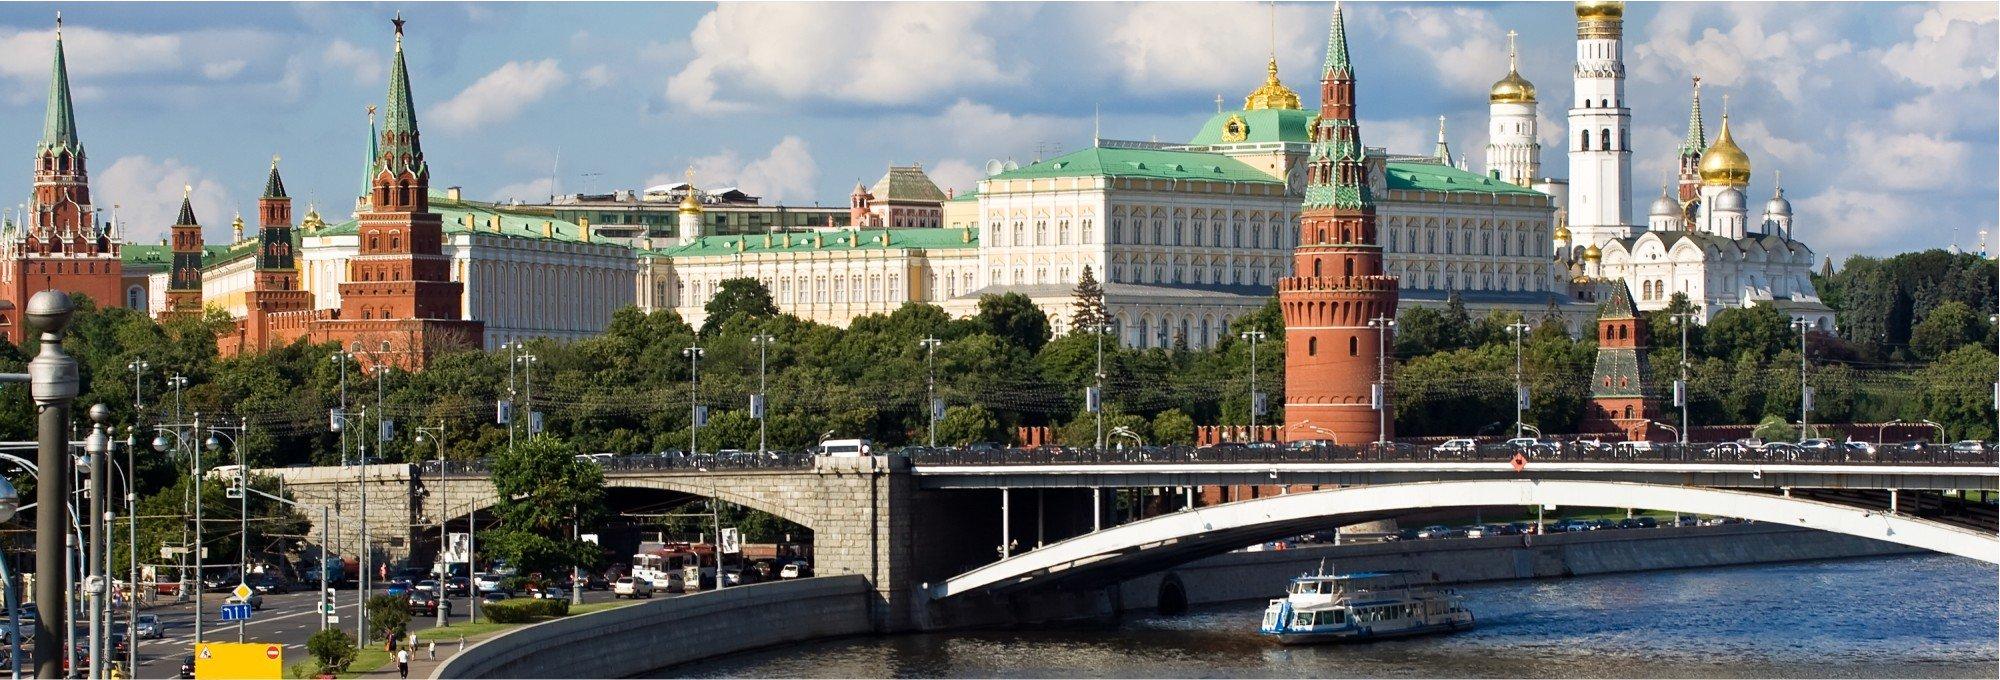 Smart Tours European River Cruises